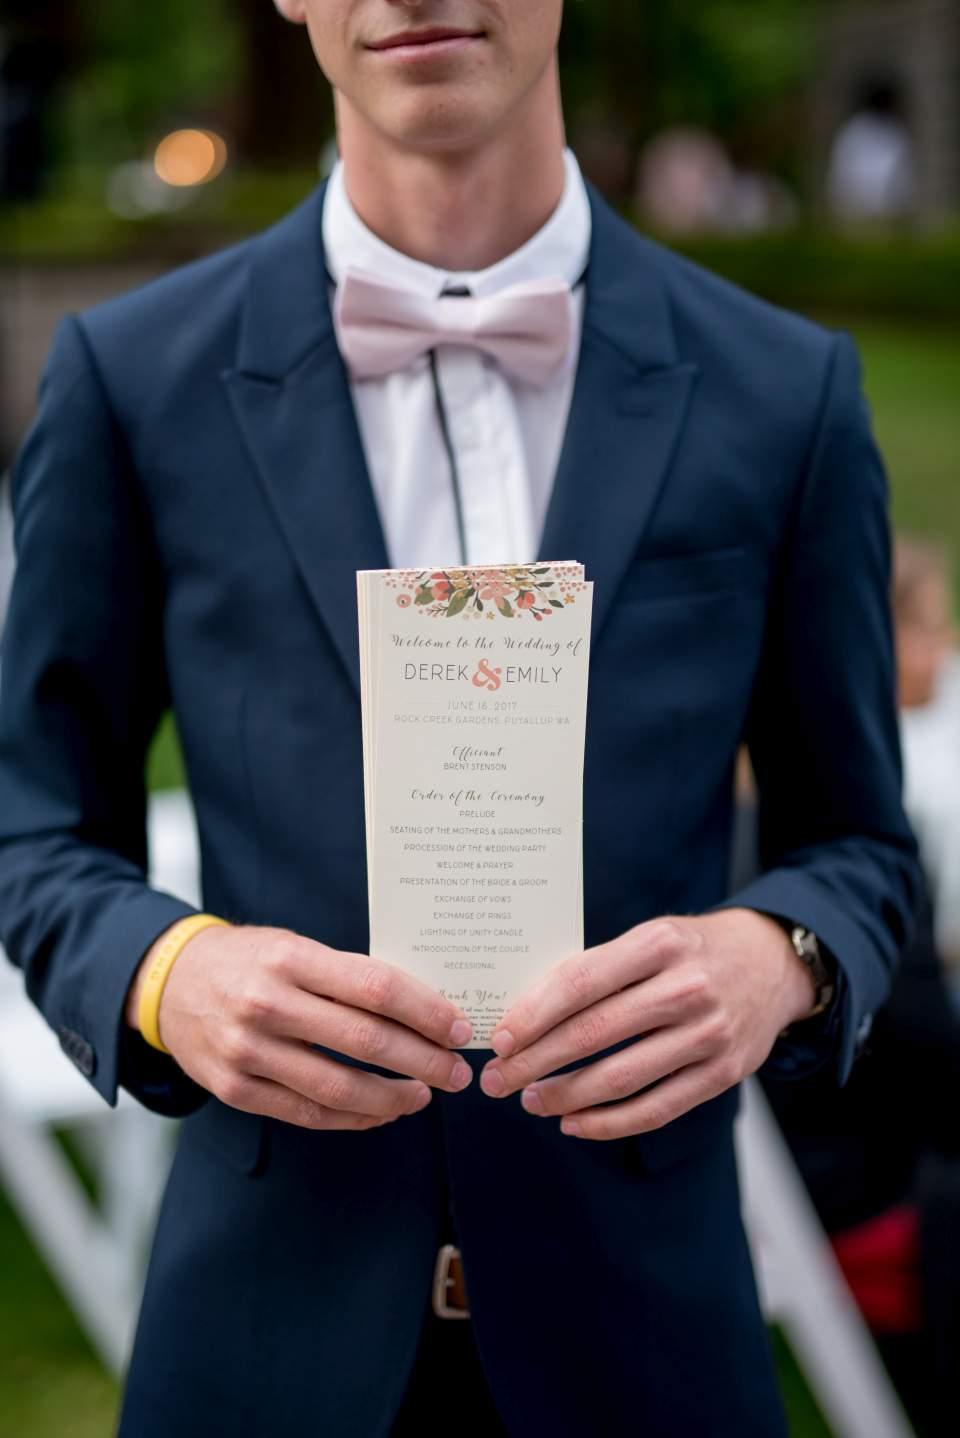 wedding usher handing out programs